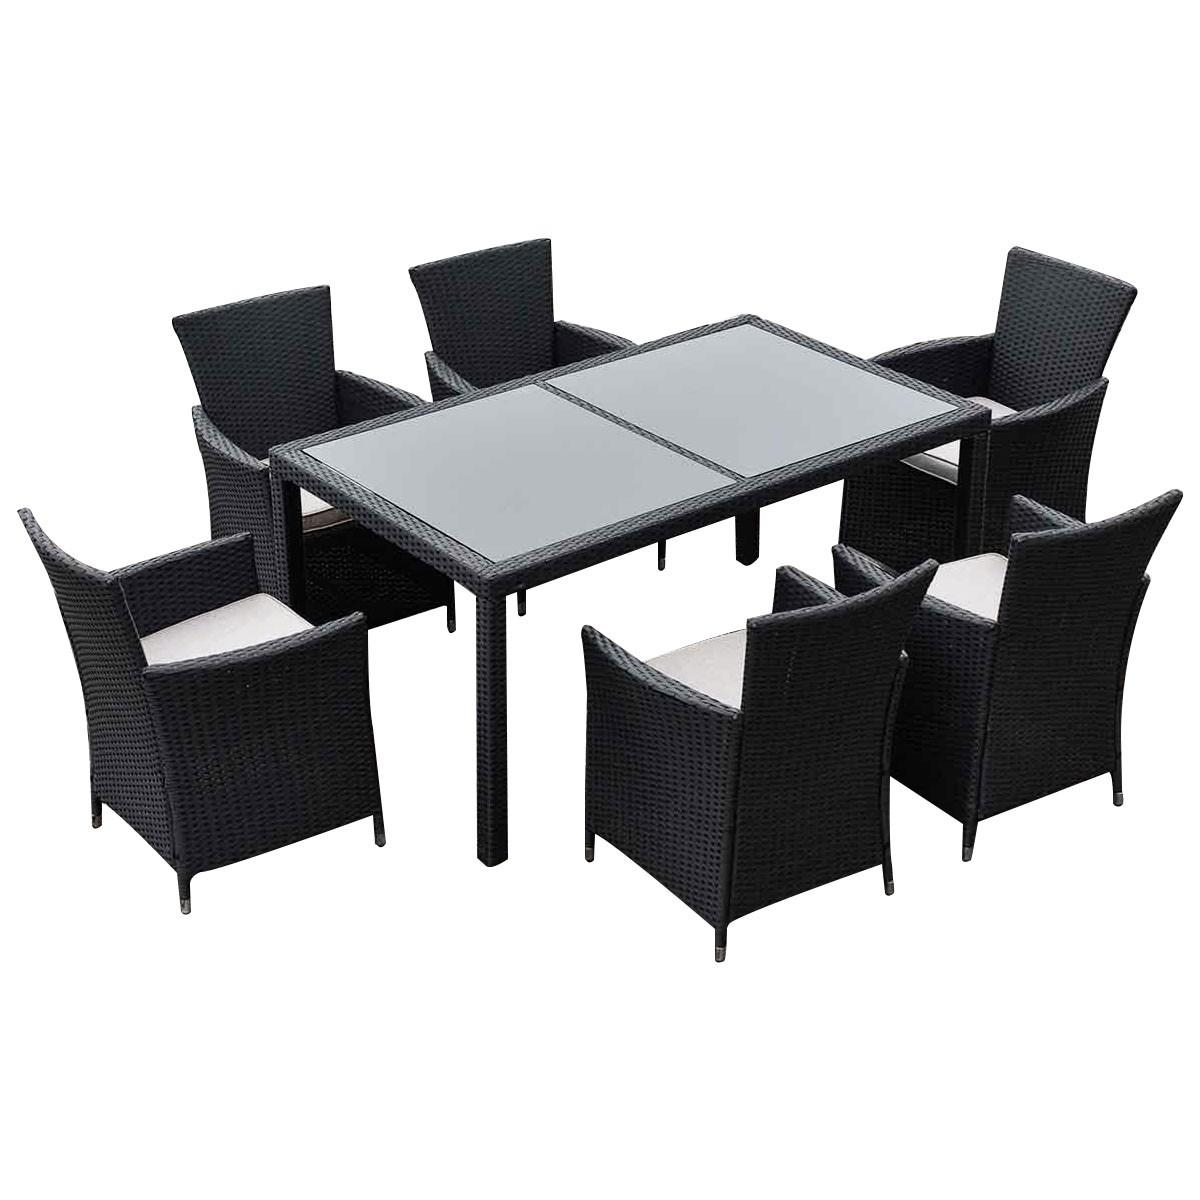 Malibu  Seater Patio Furniture Set Black